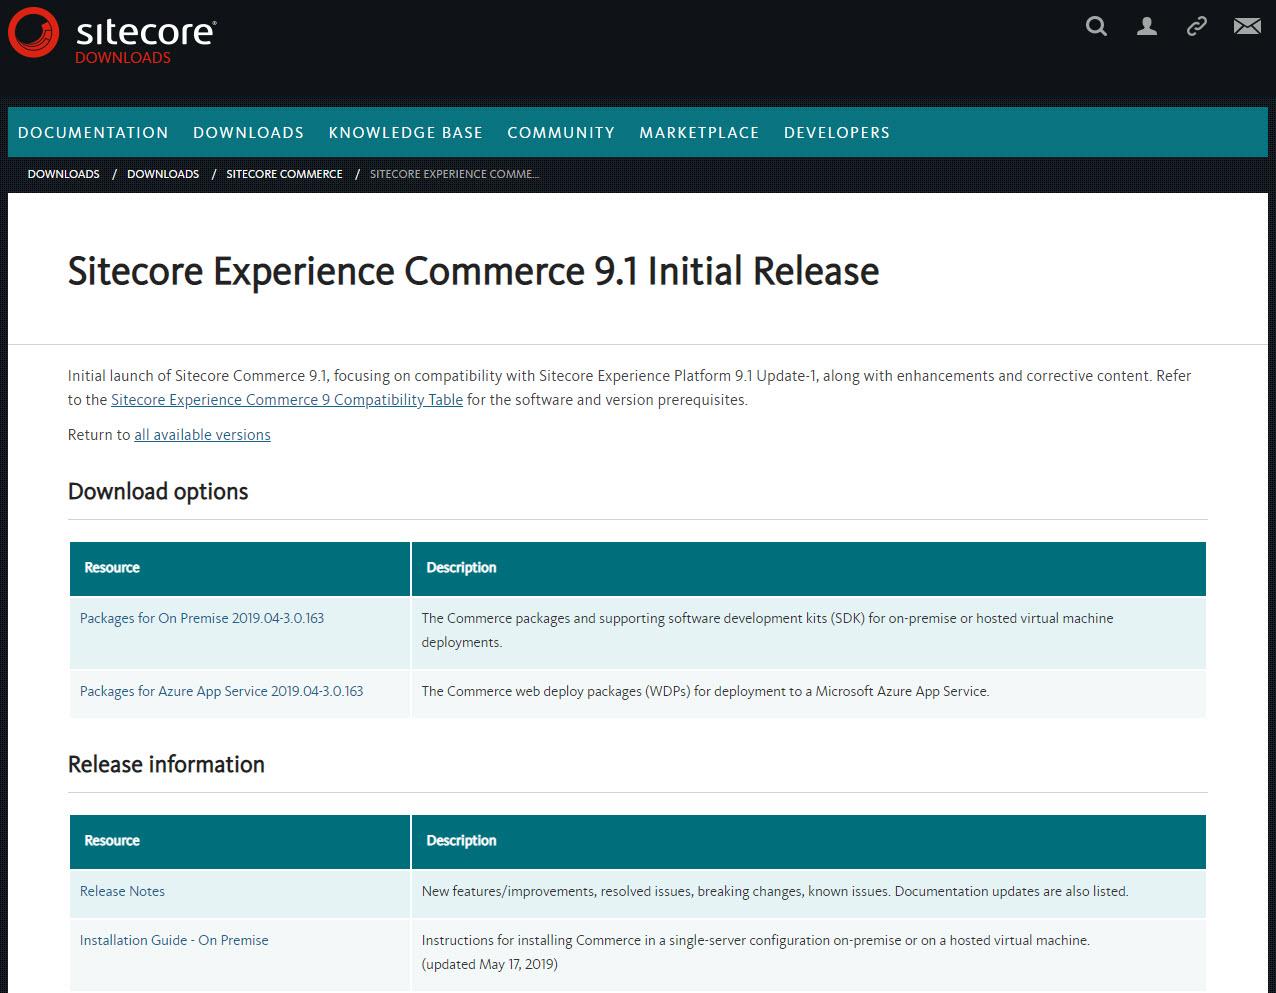 sitecore commerce 9.1 download page